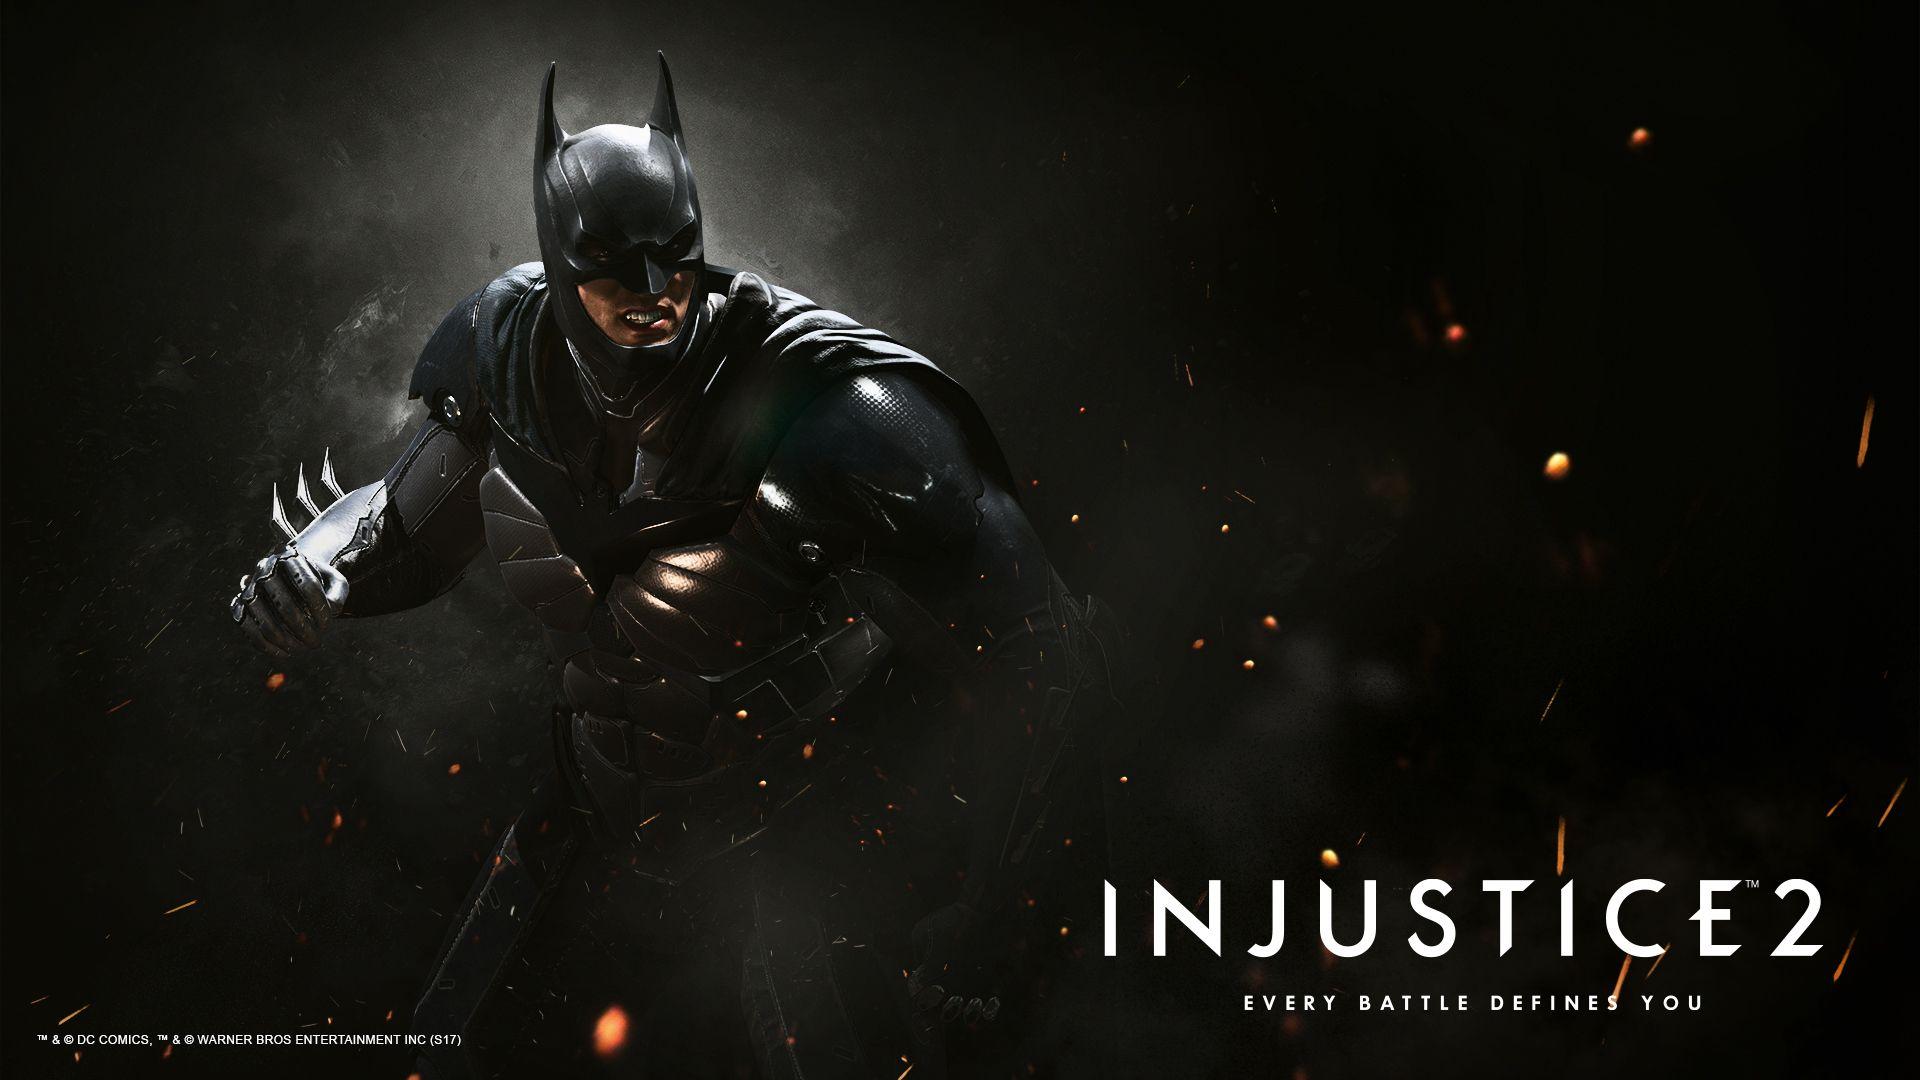 Bruce Wayne (Injustiça)